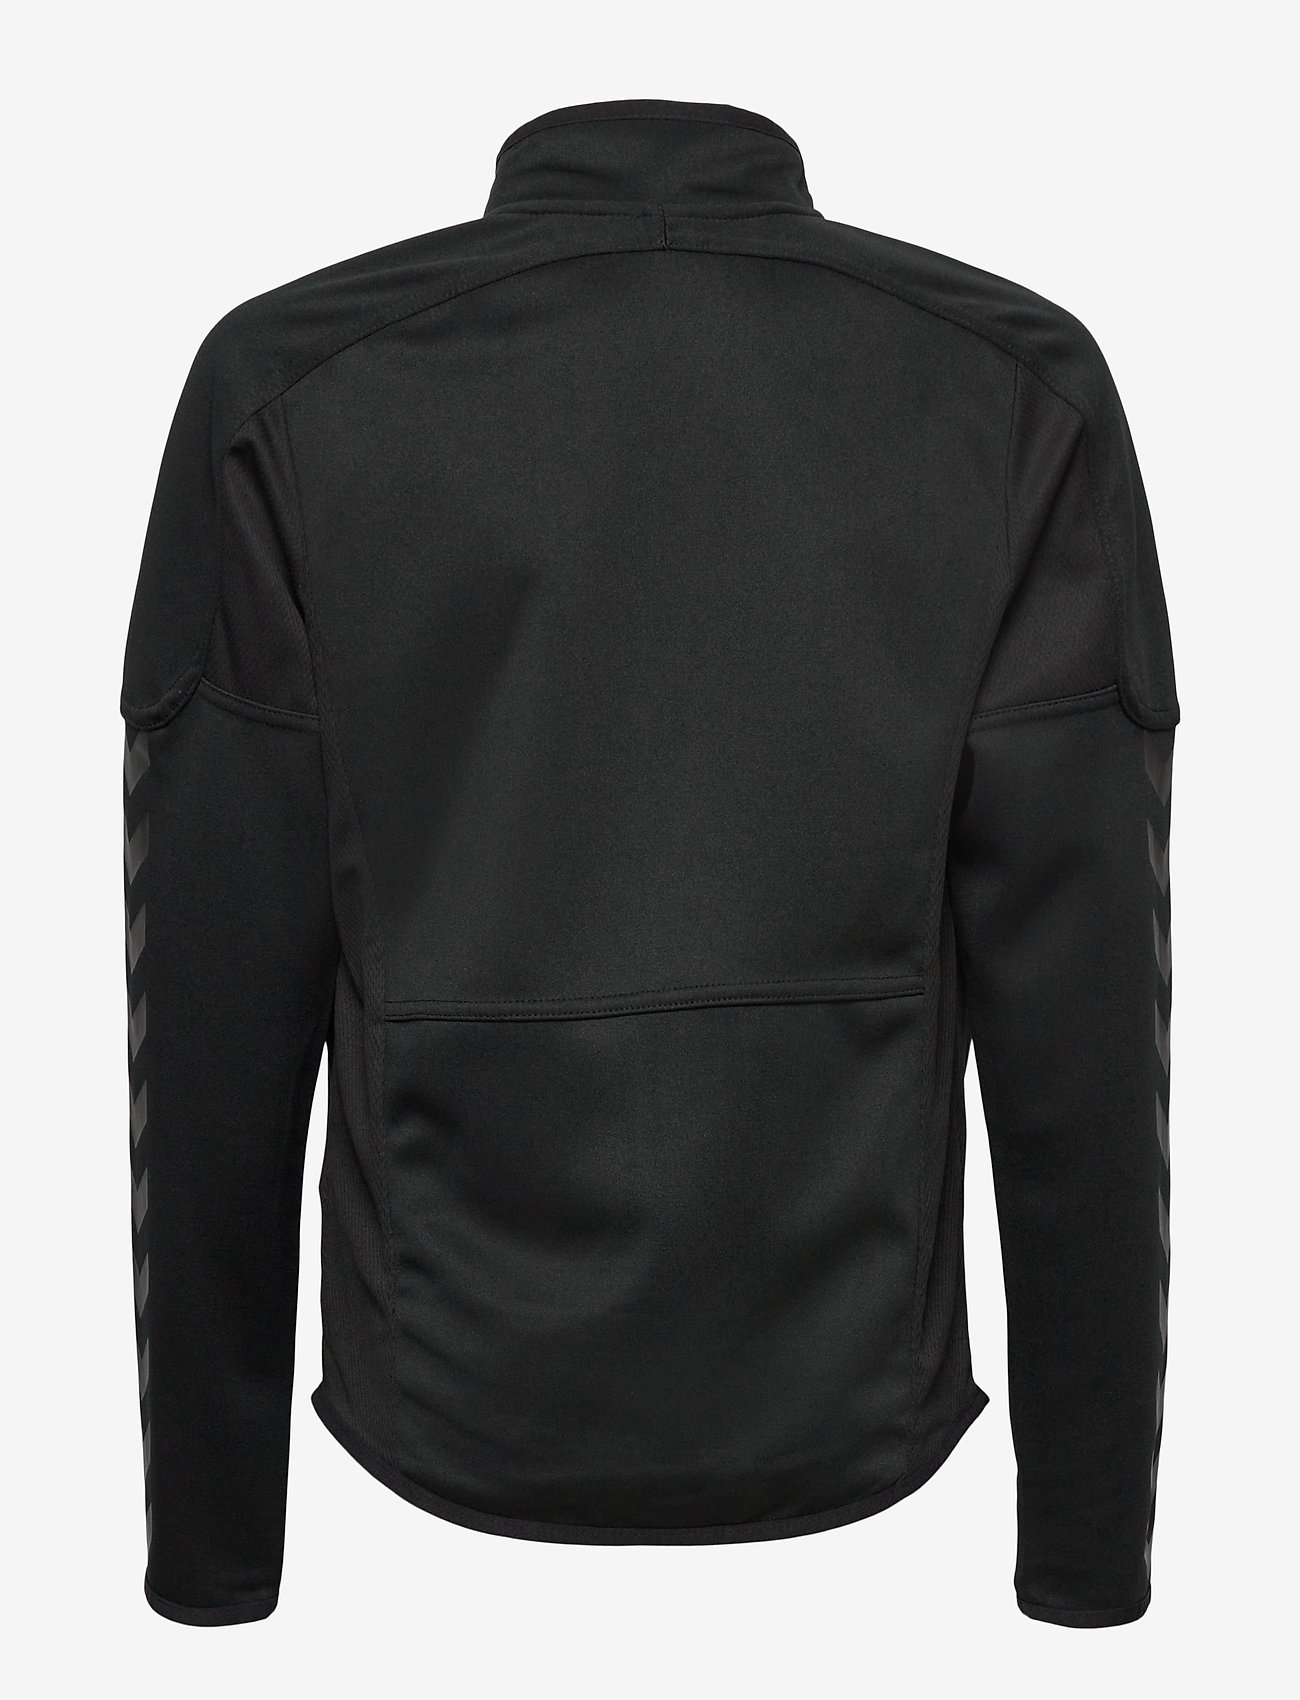 Hummel - CLASSIC BEE PHI ZIP JACKET - sweat-shirt - black - 1